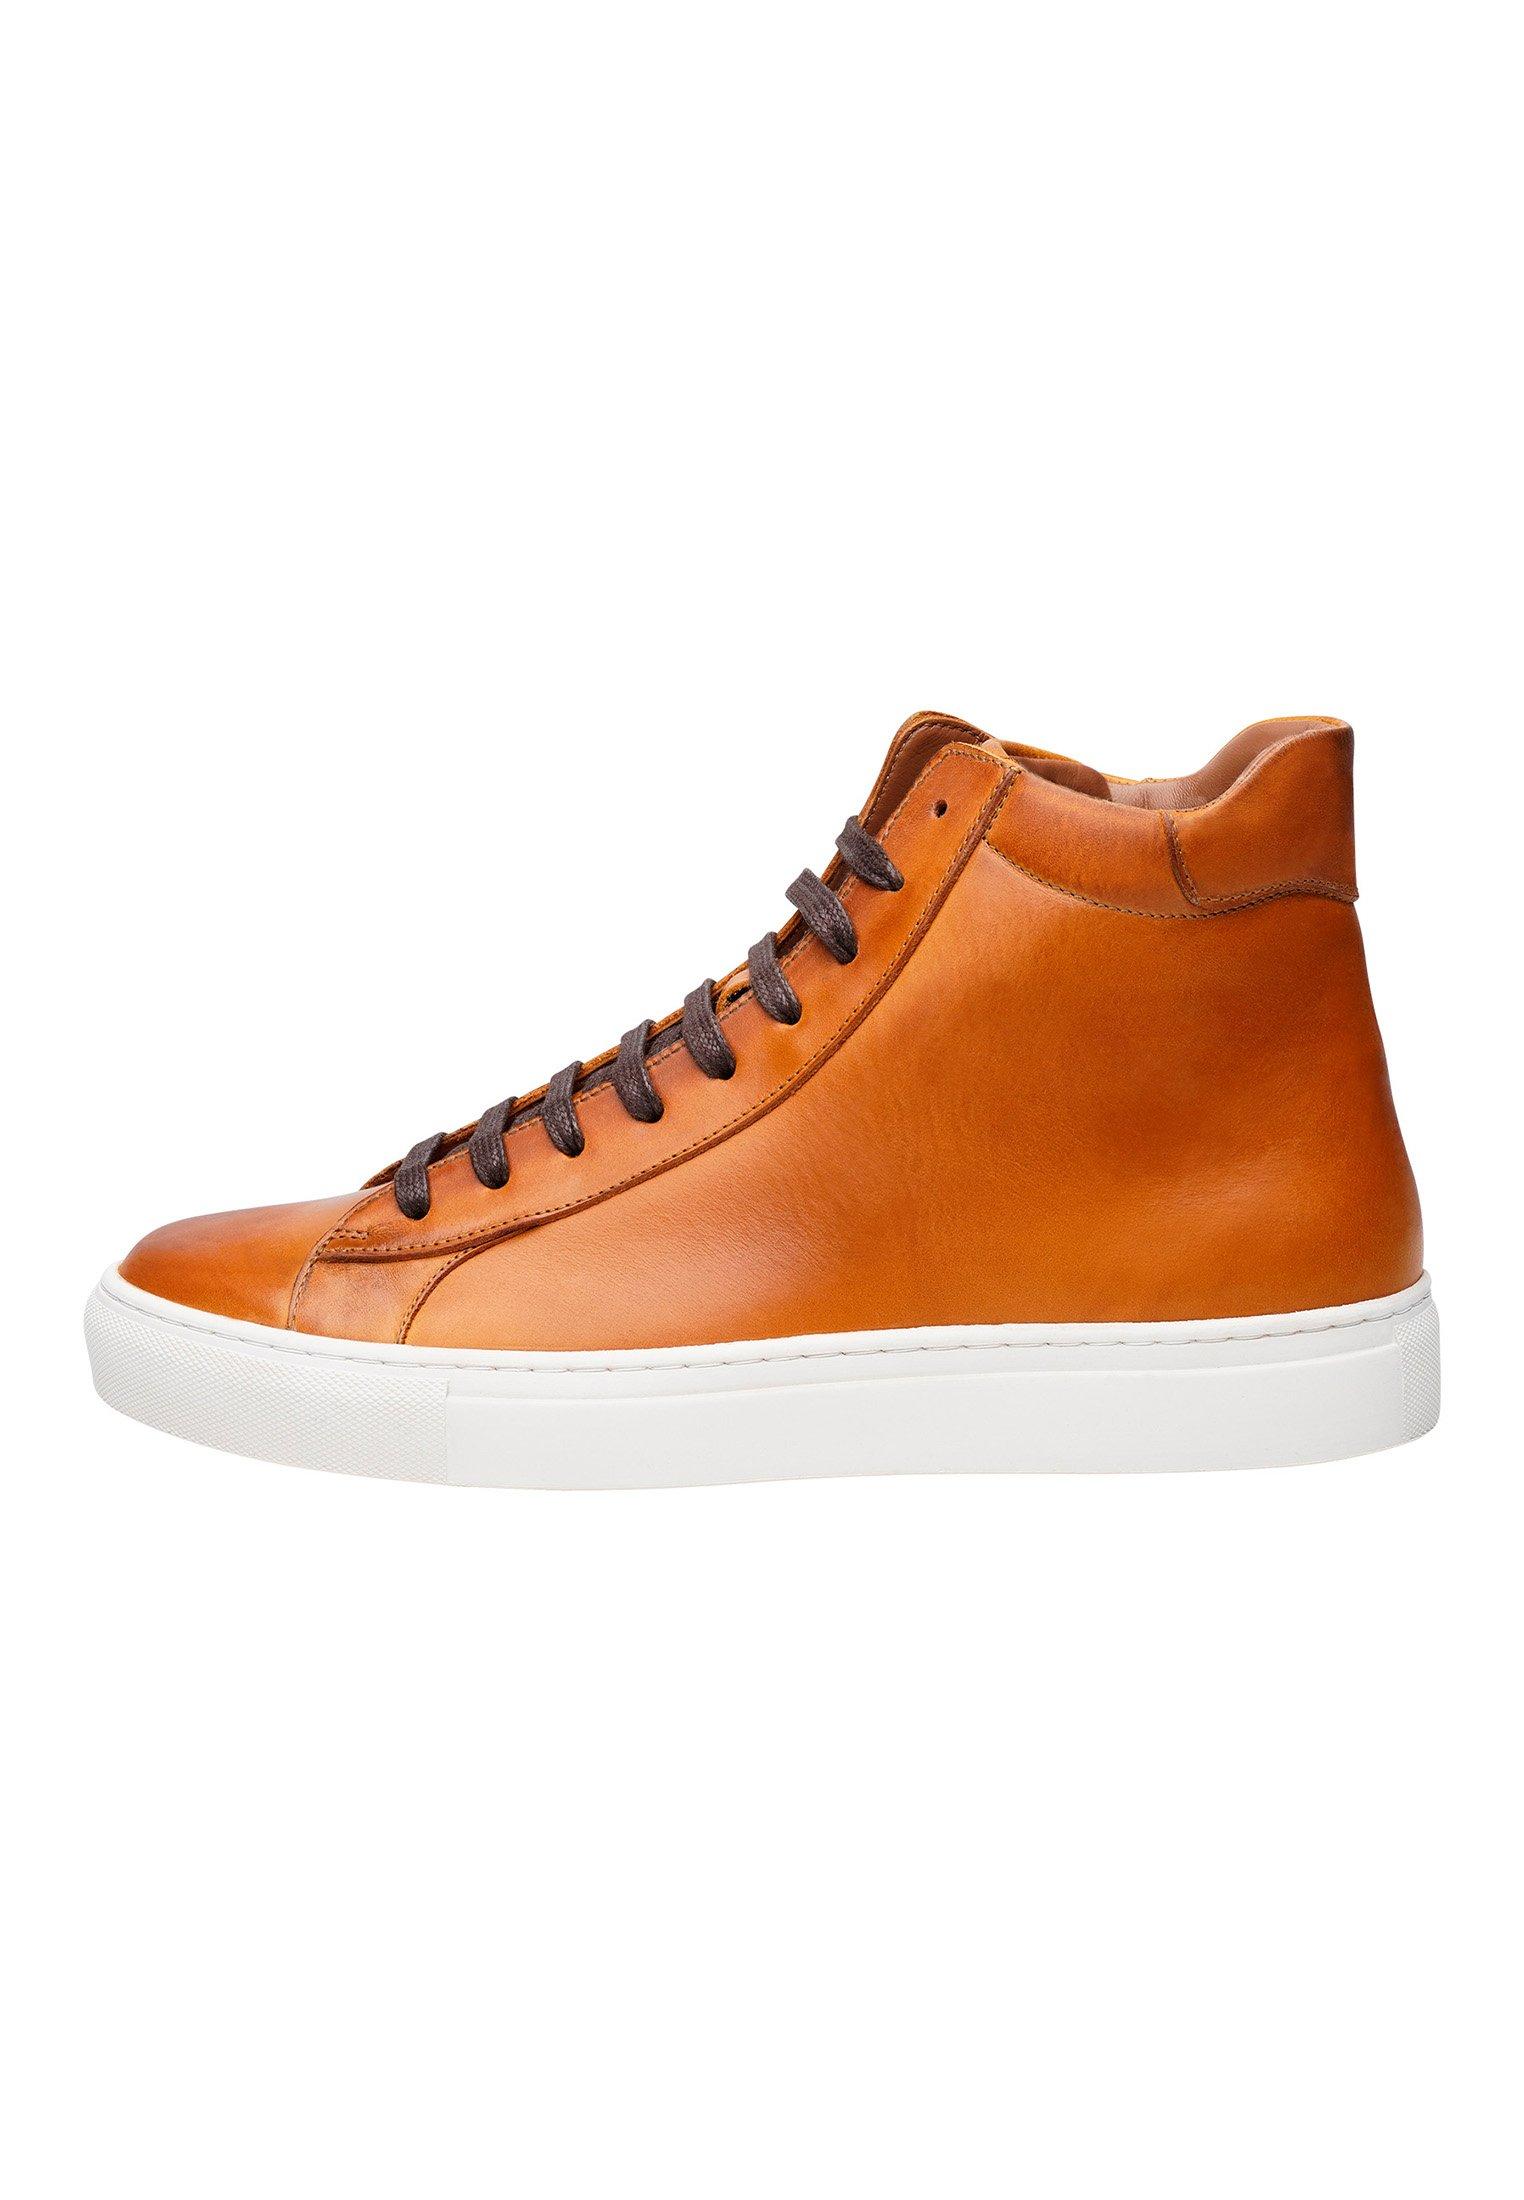 Uomo NO. 121 MS - Sneakers basse